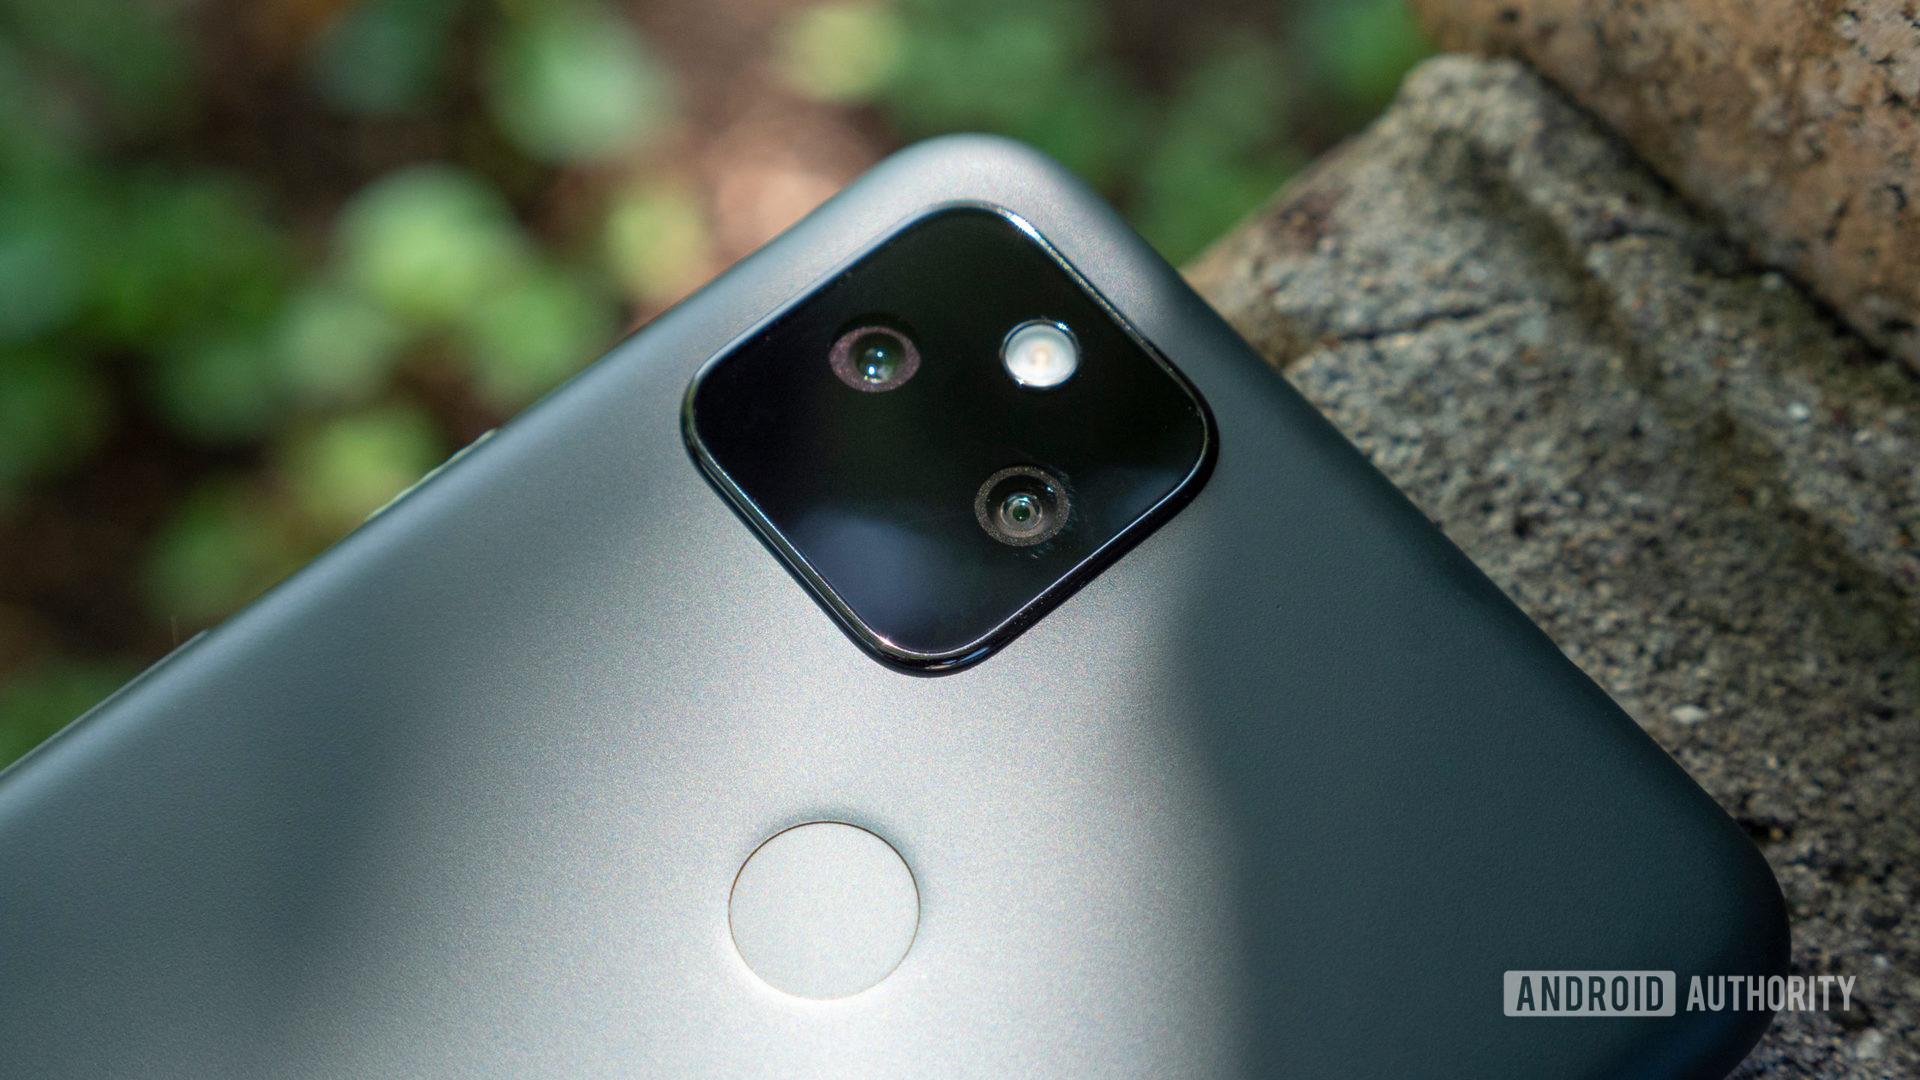 the google pixel 5a camera module and fingerprint sensor